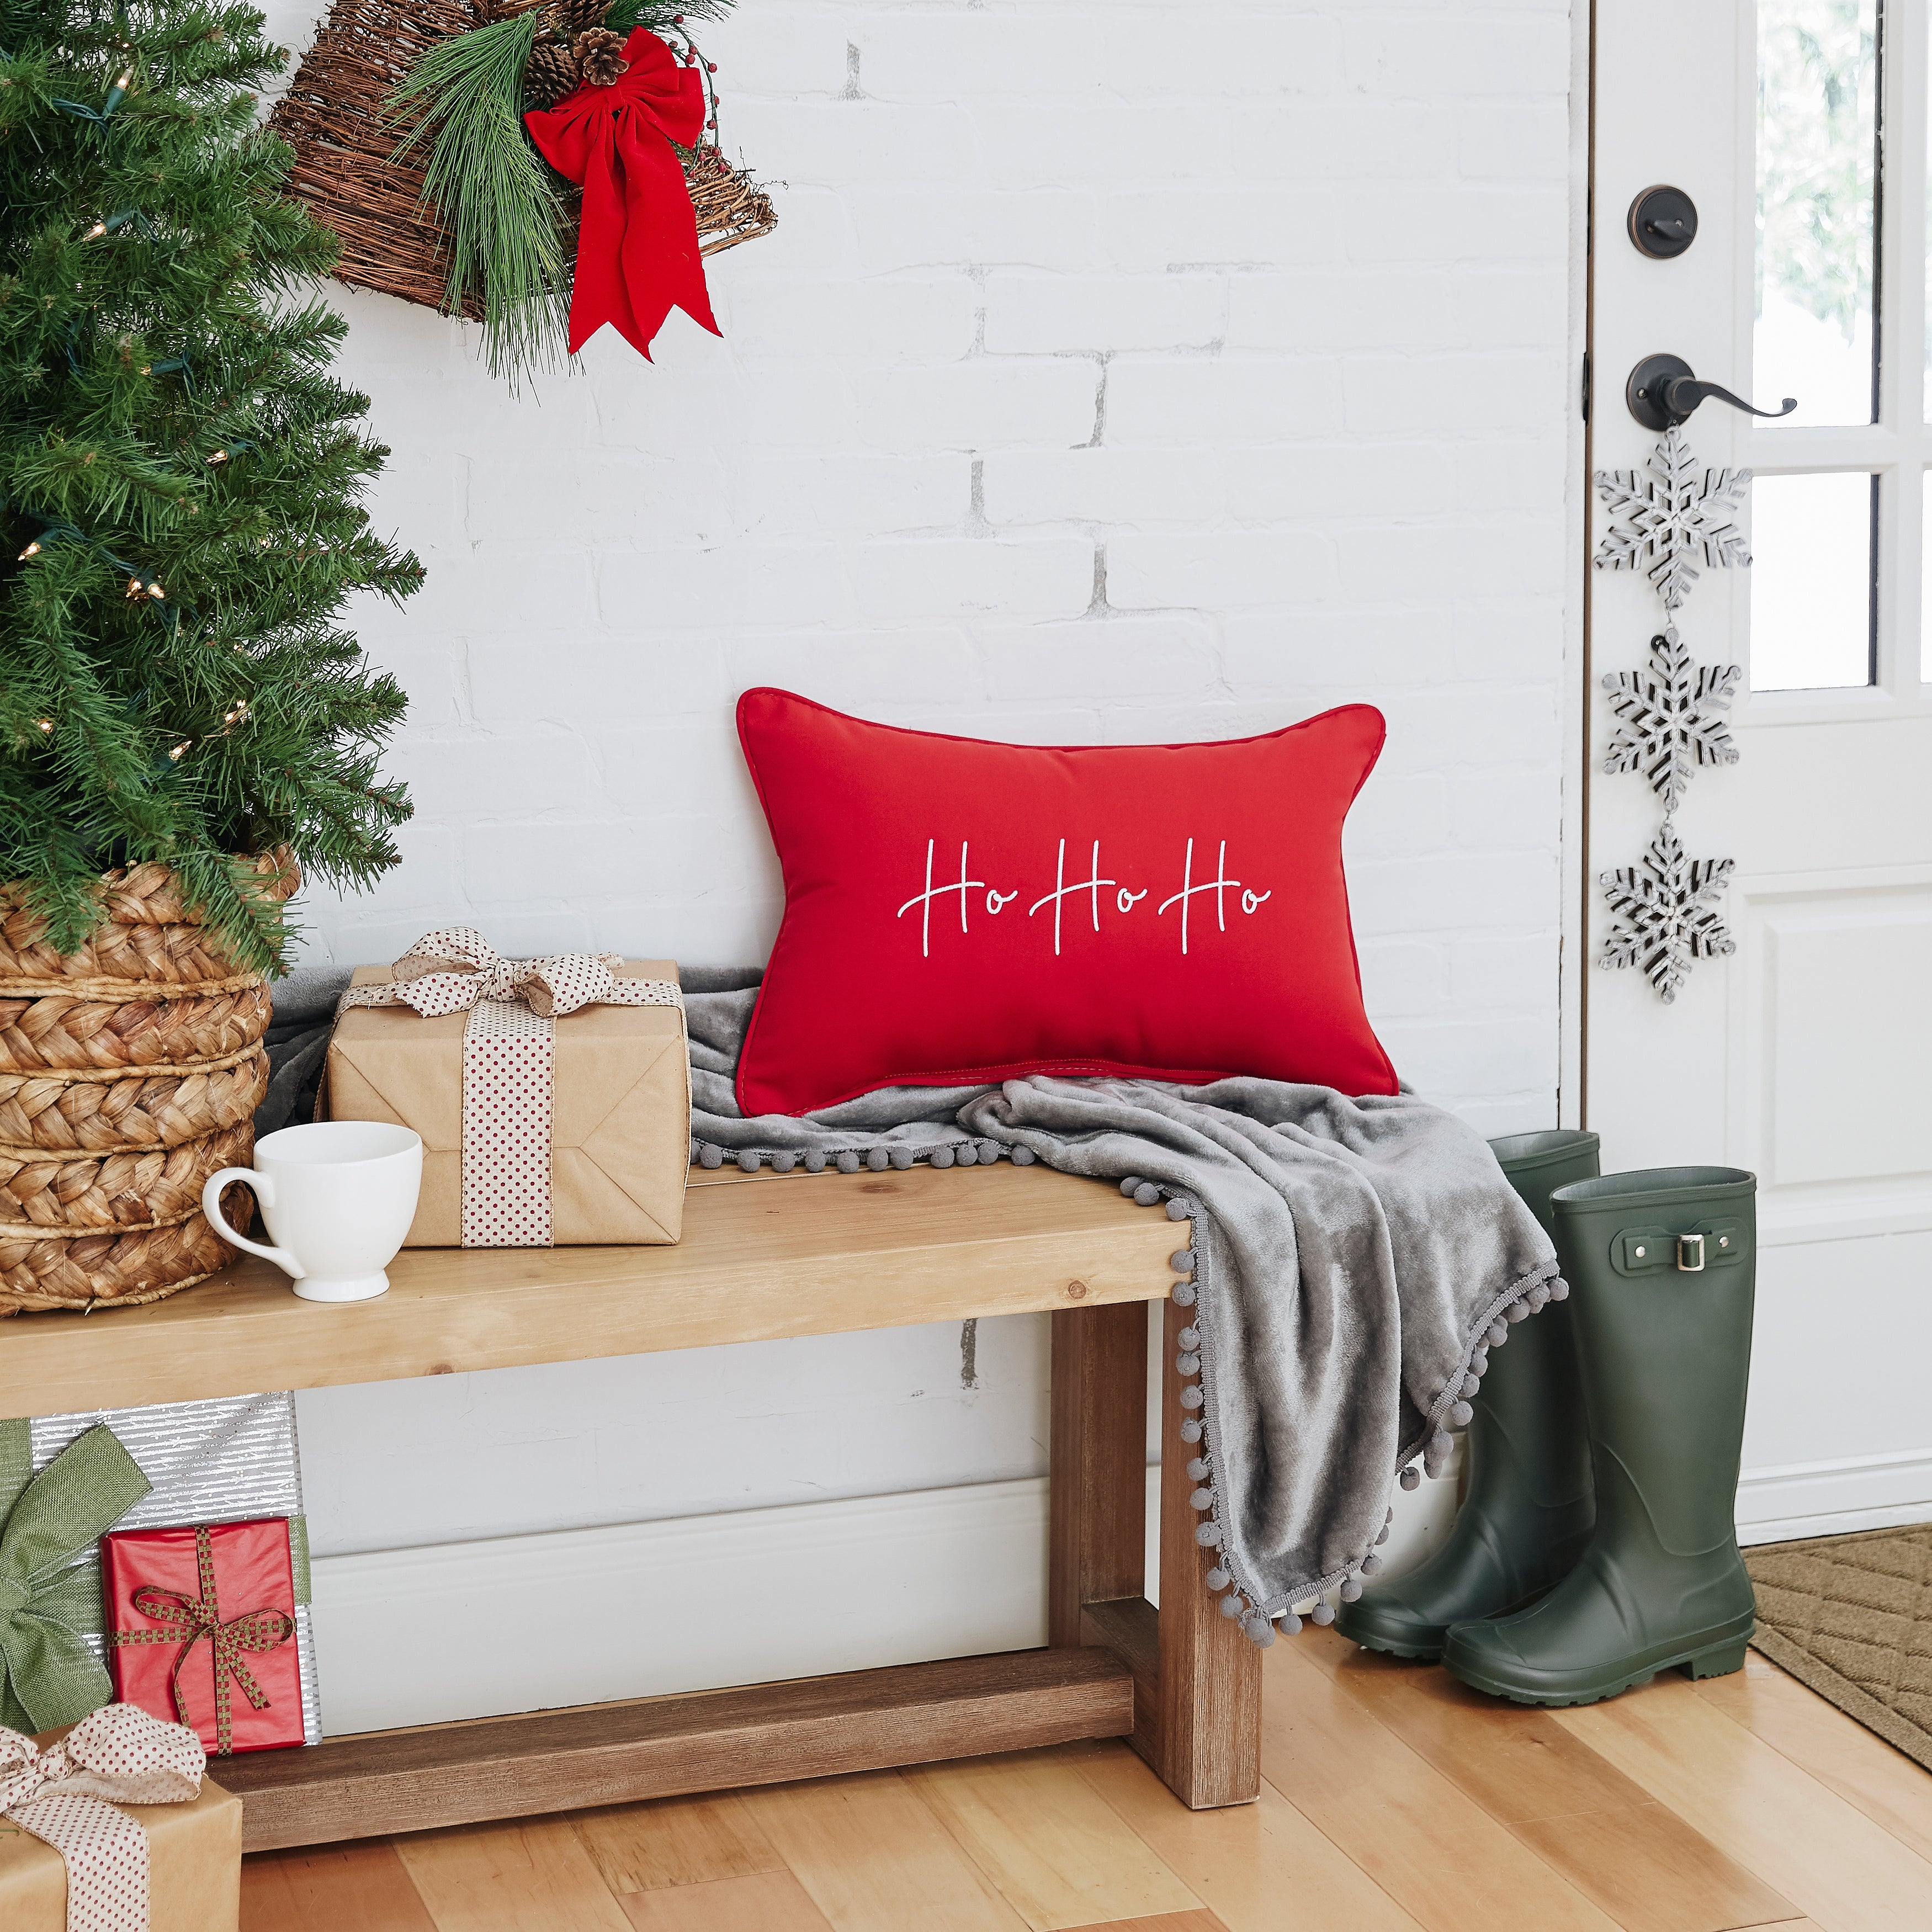 BAH HUMBUG Sunbrella Indoor Outdoor Christmas Pillow Cover Holiday decor|  oba canvas Christmas Decorations Holiday Throw Pillow